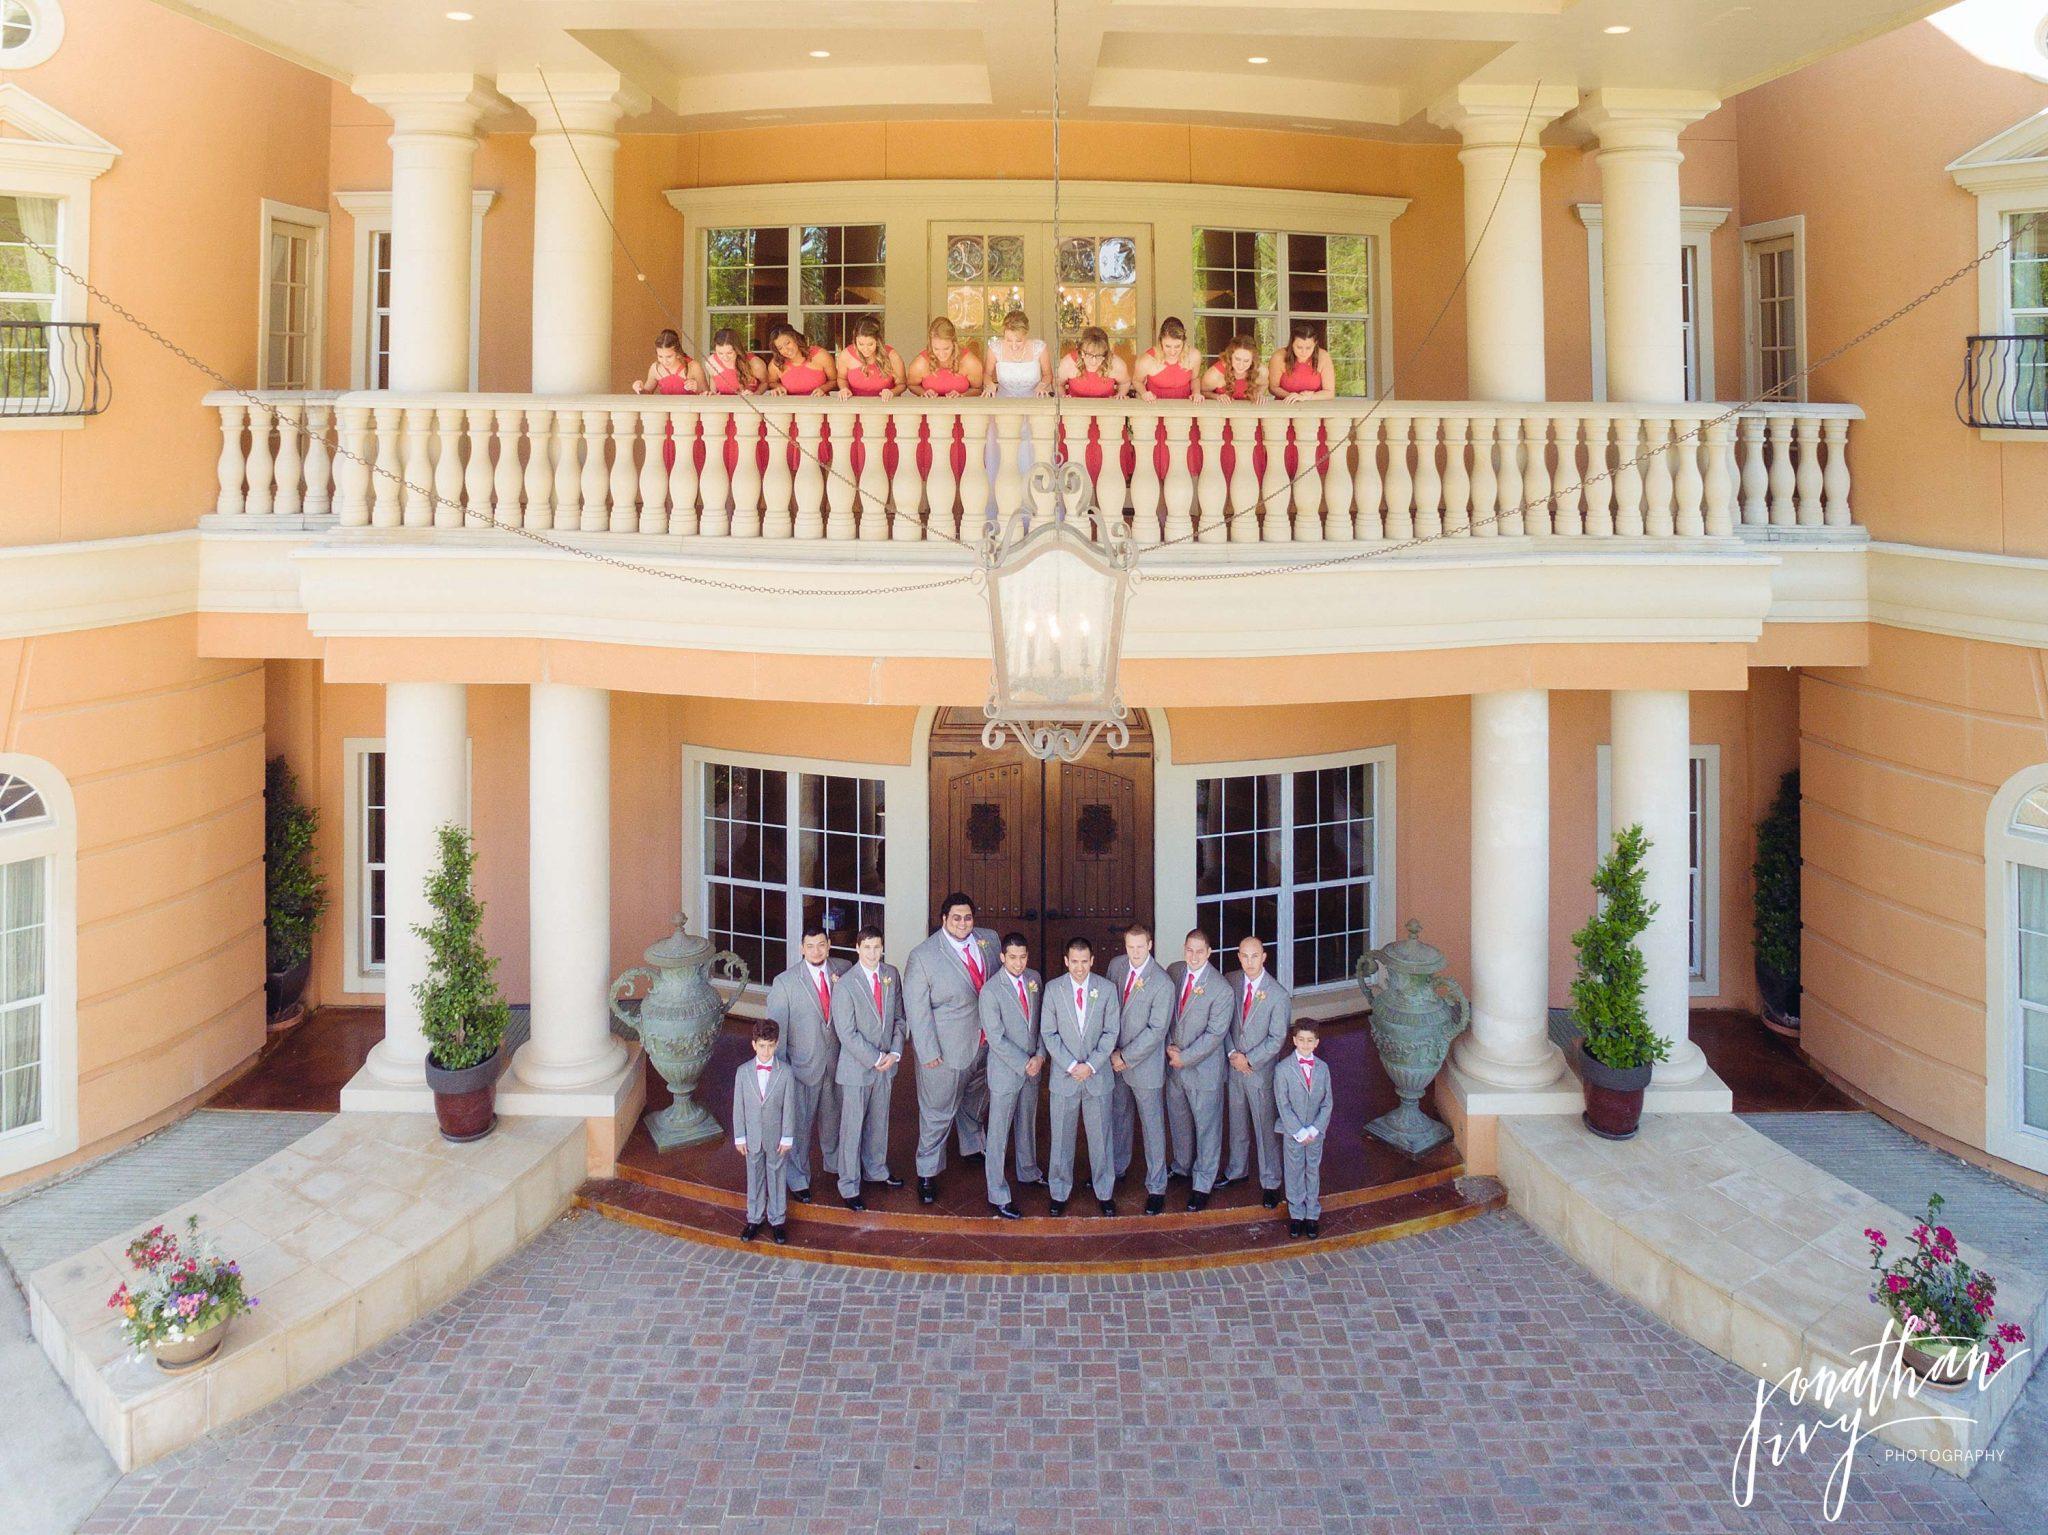 Chateau-polonez-wedding-houston_0008